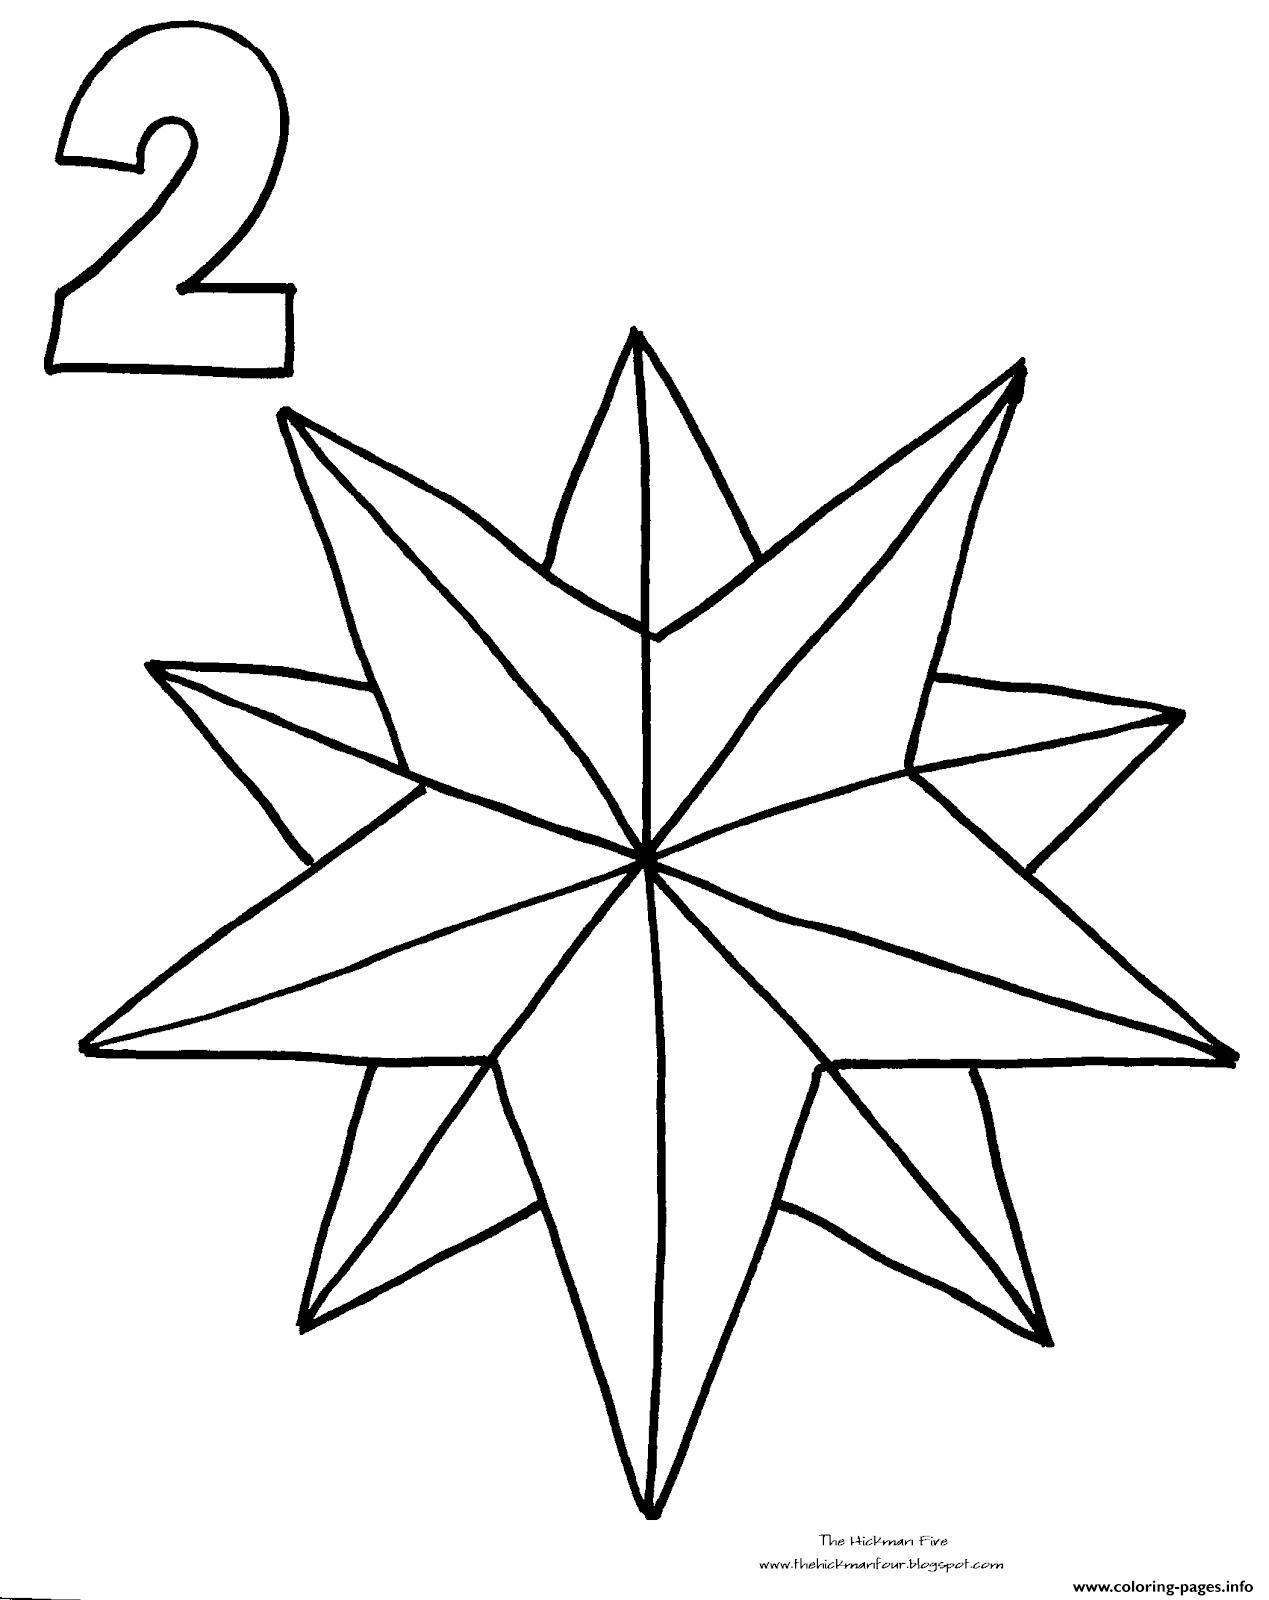 Christmas Lights Color Pages Sensational Design Christmas Star Coloring Pages For Kids Page And